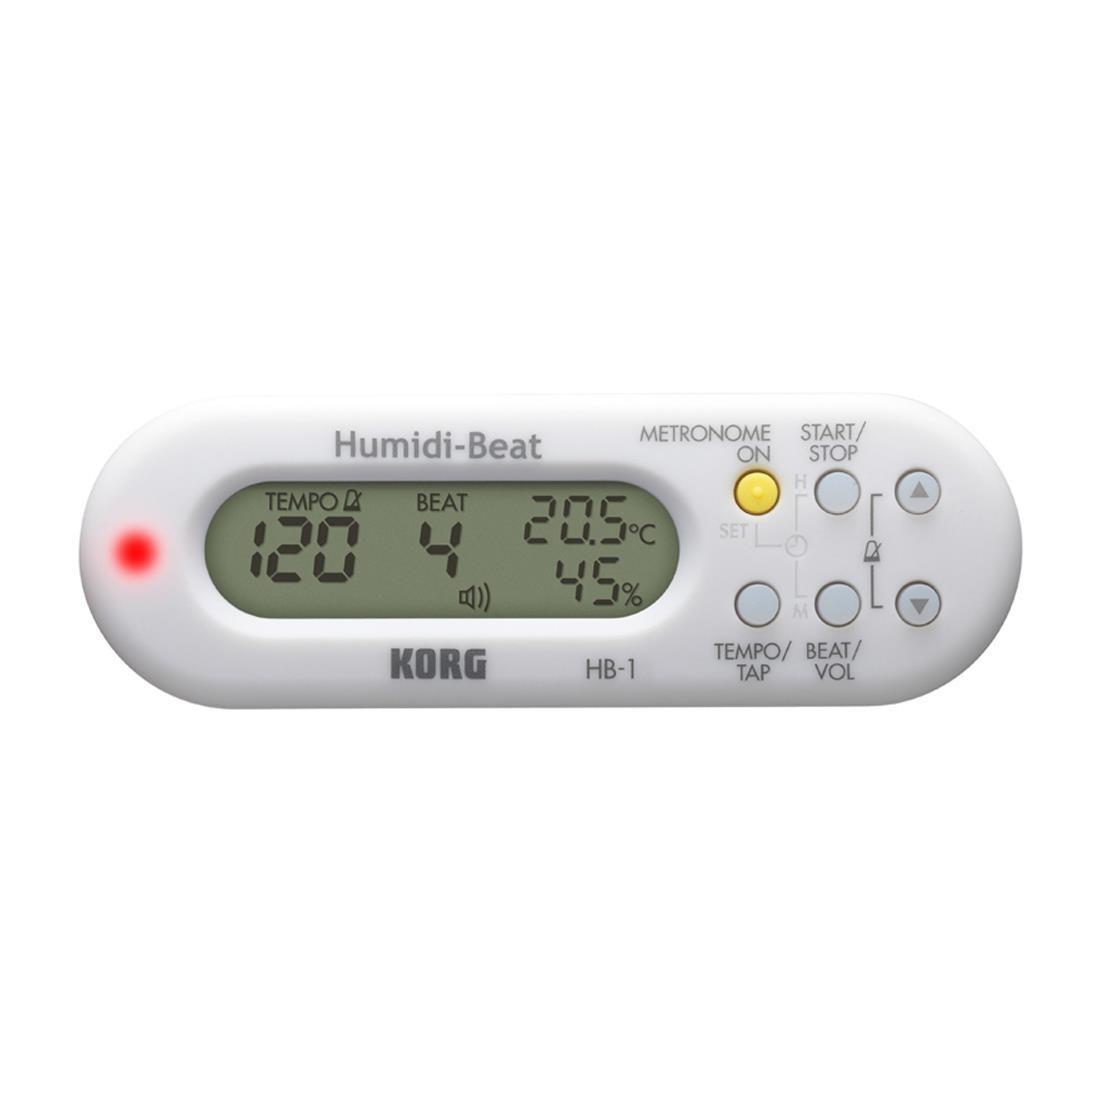 Metrônomo Digital Korg Humidi-Beat HB1 Wh